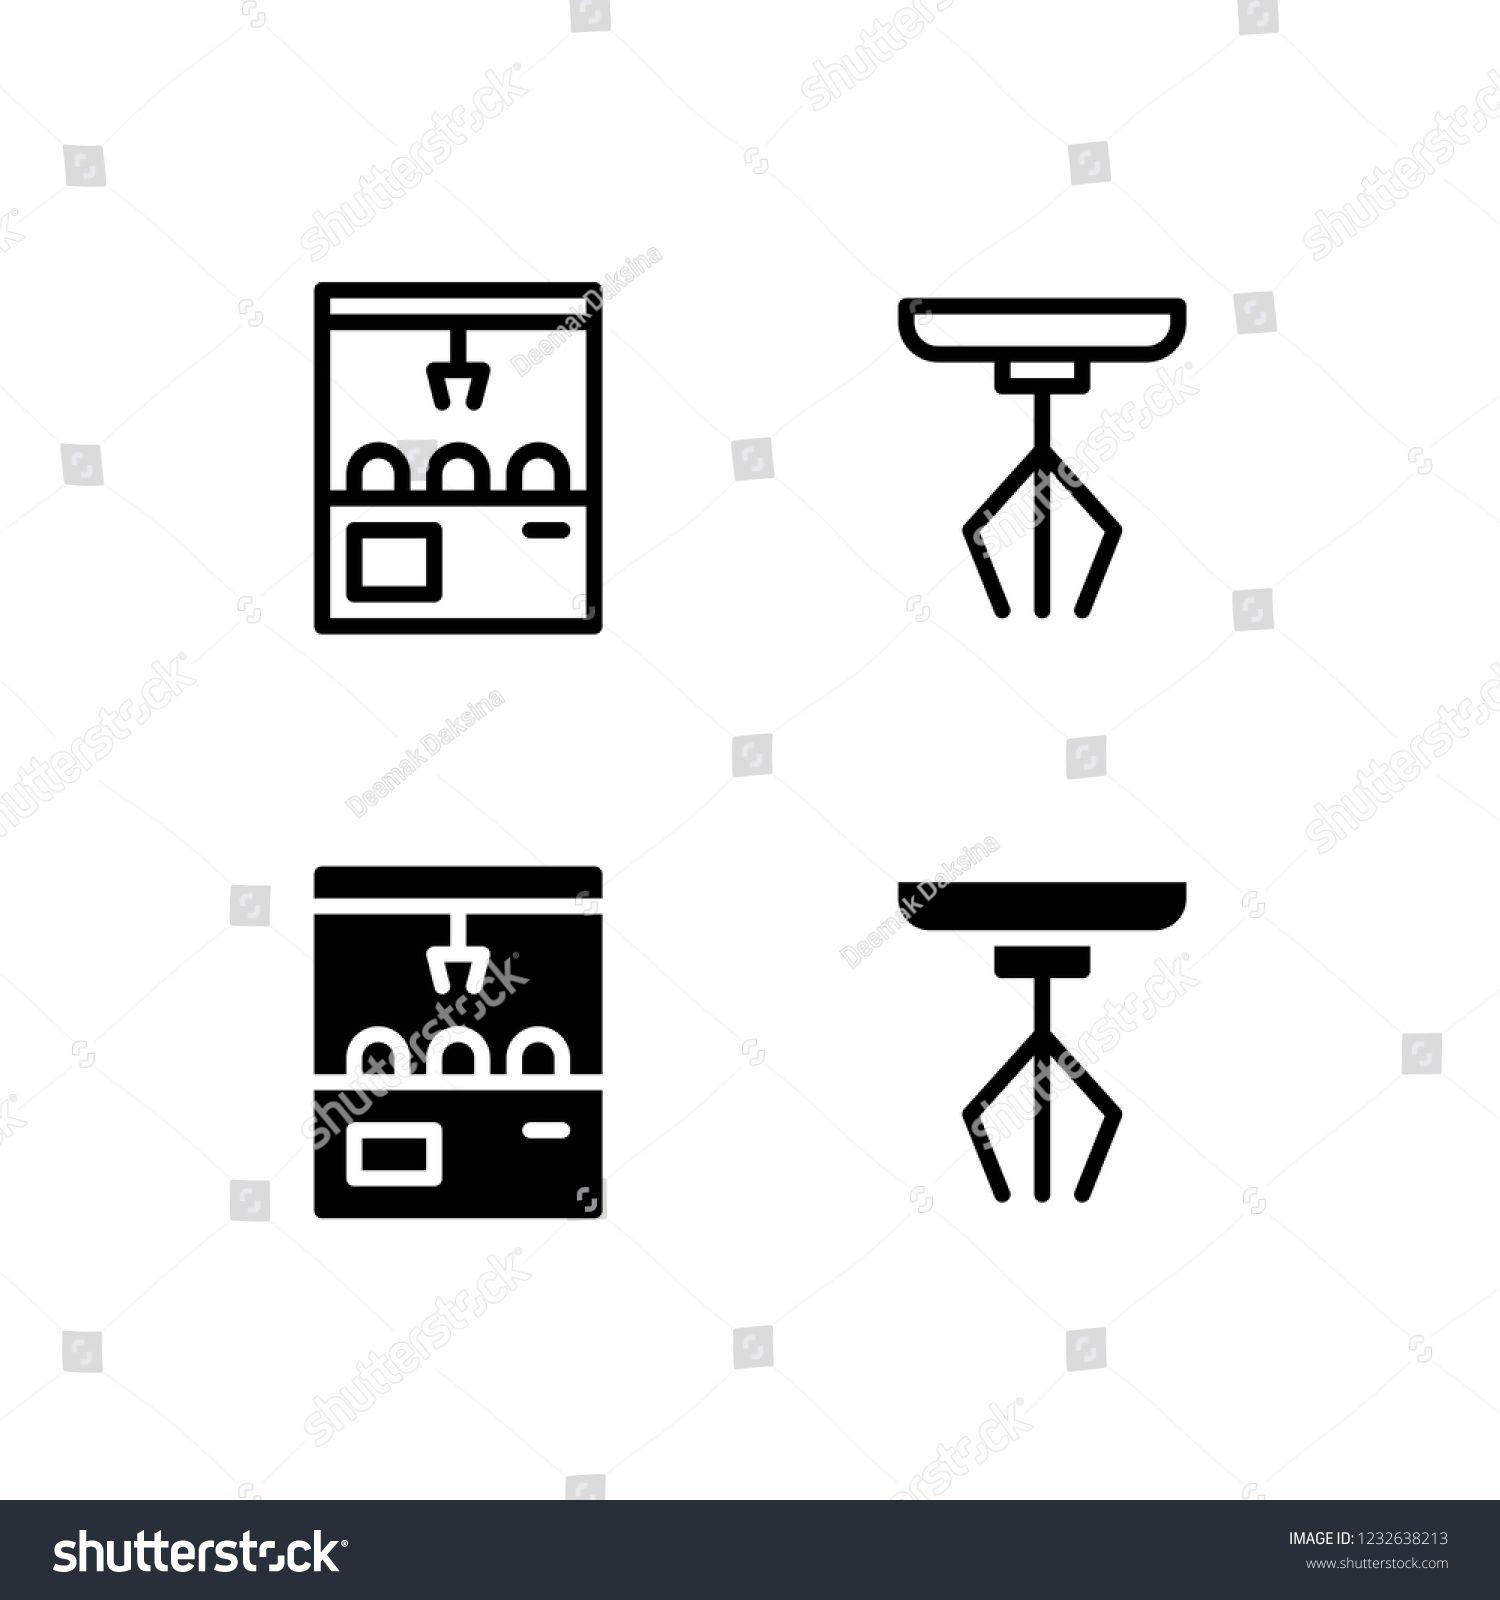 medium resolution of claw machine icon design claw machine grabber robotic amusement icon logo vector symbol set sign design button